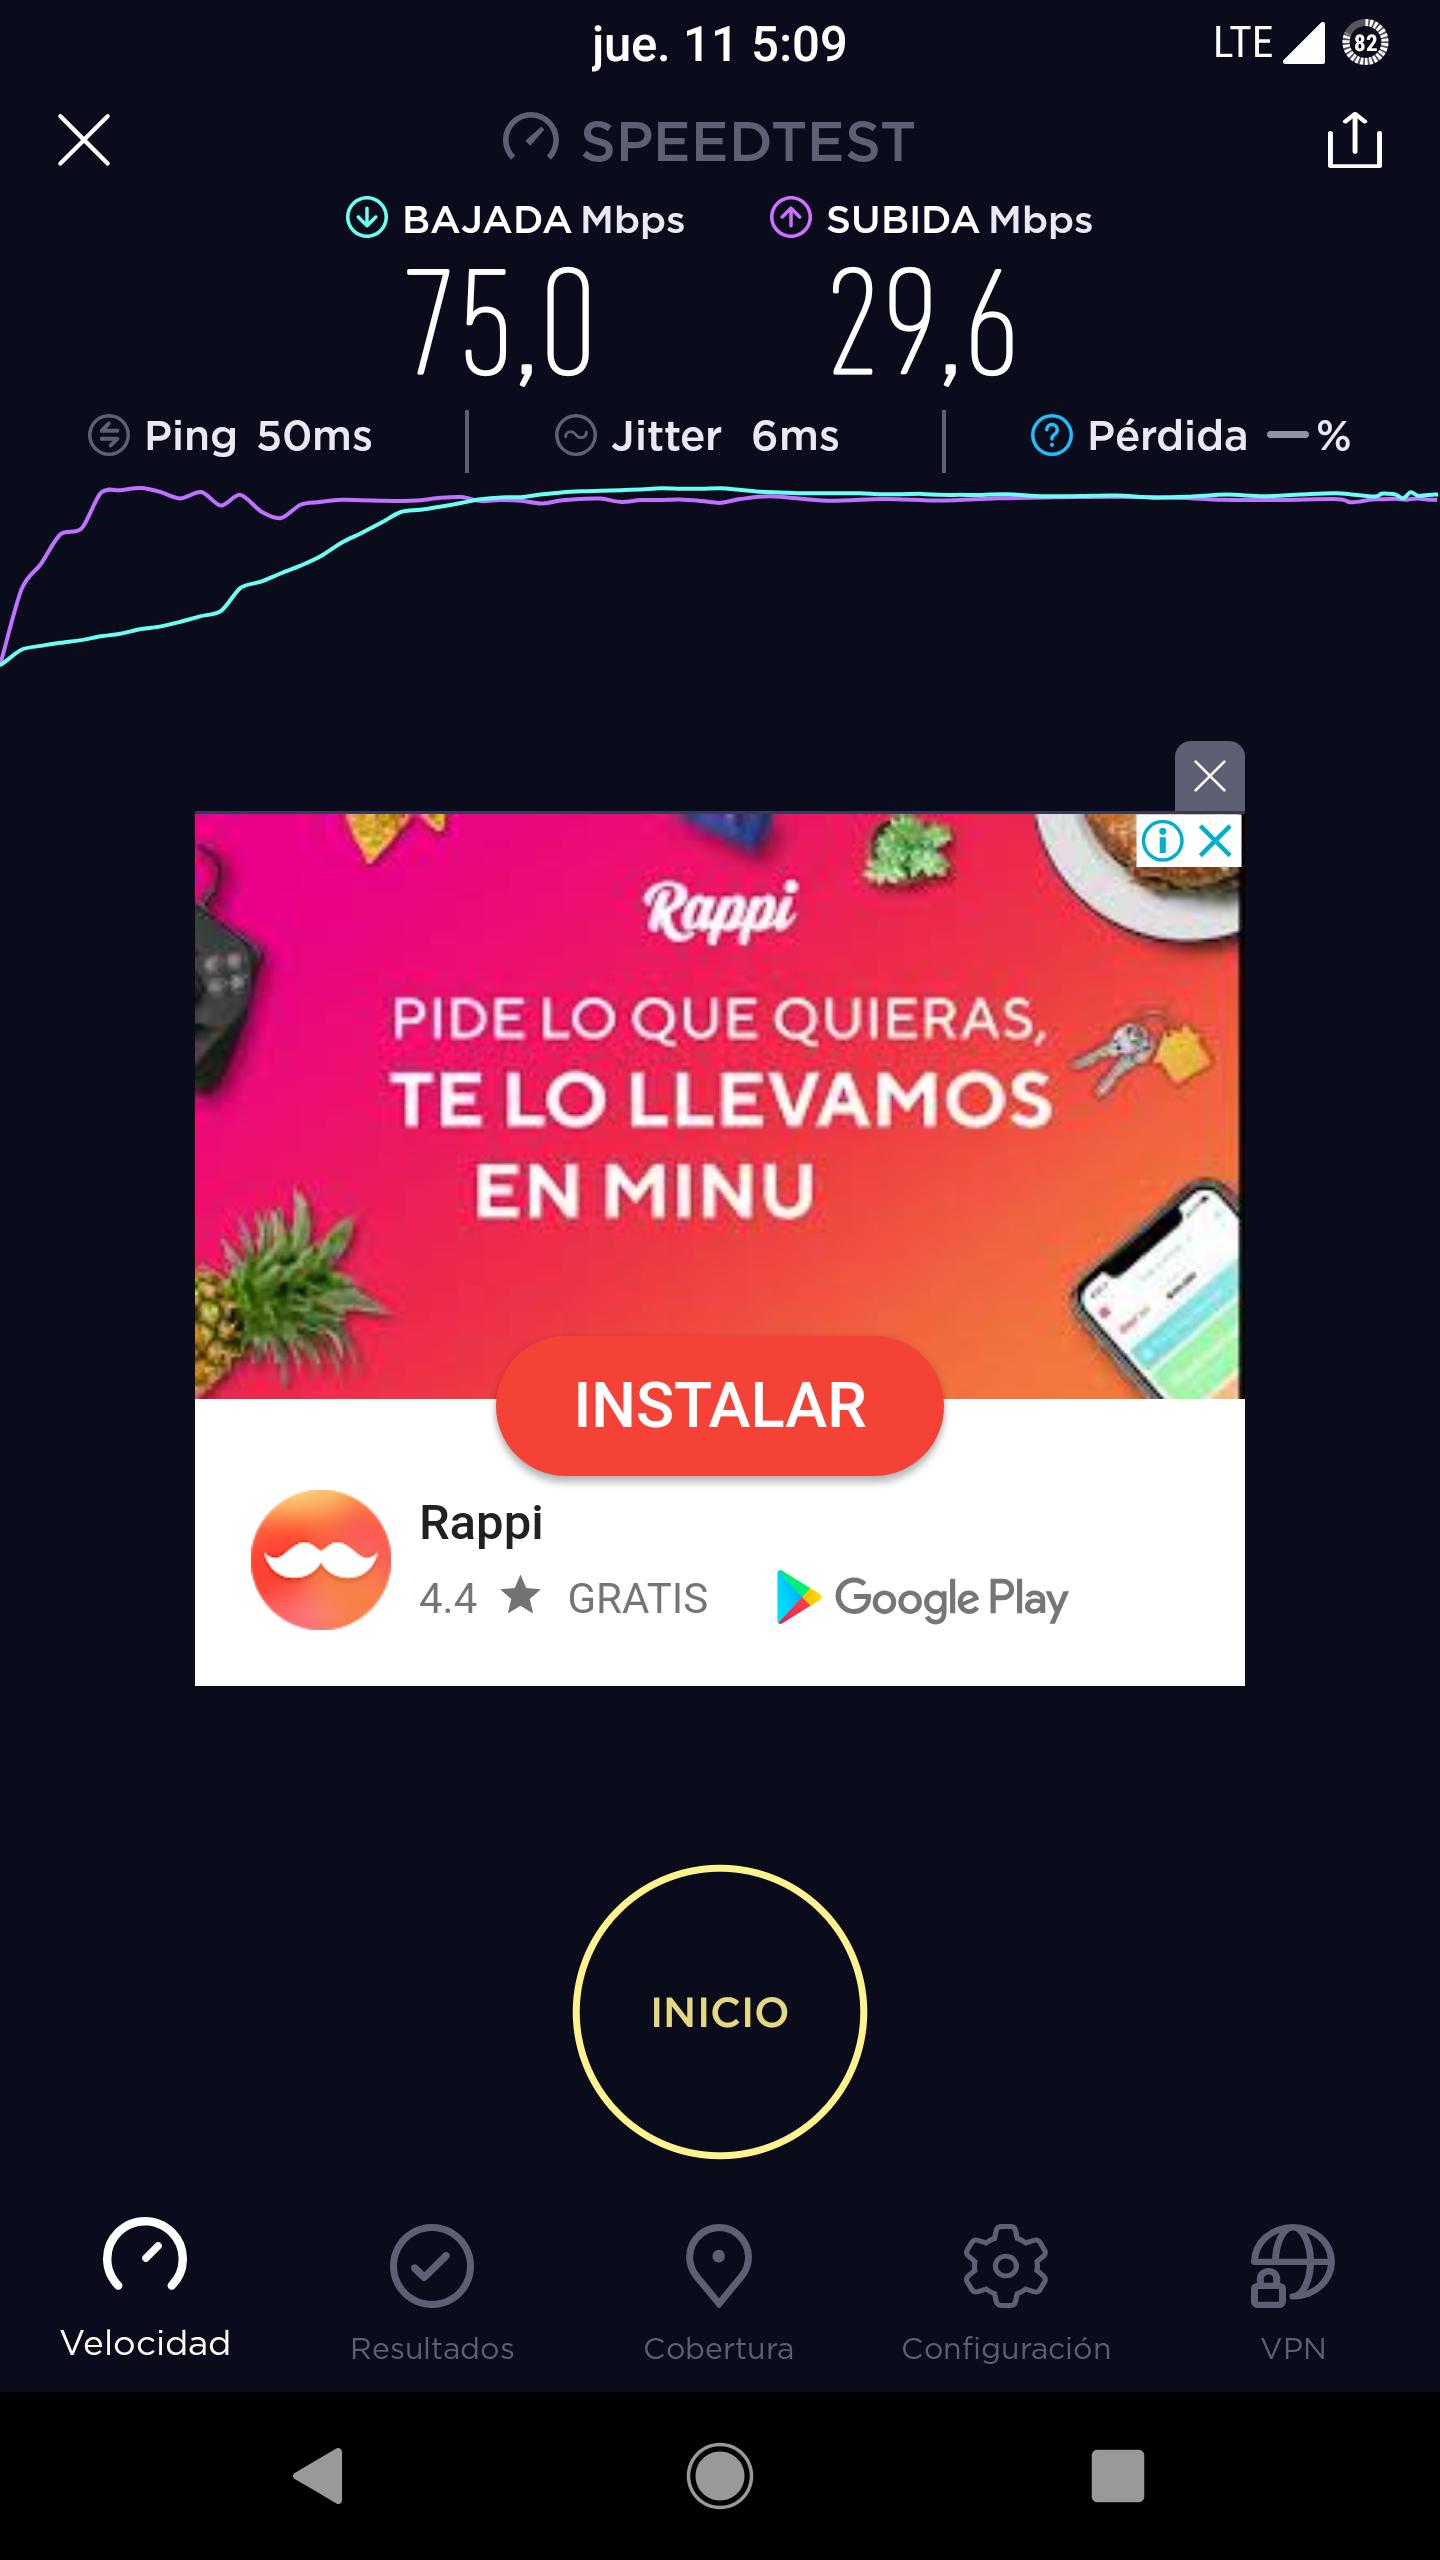 Screenshot_Speedtest_20181011-050952.png